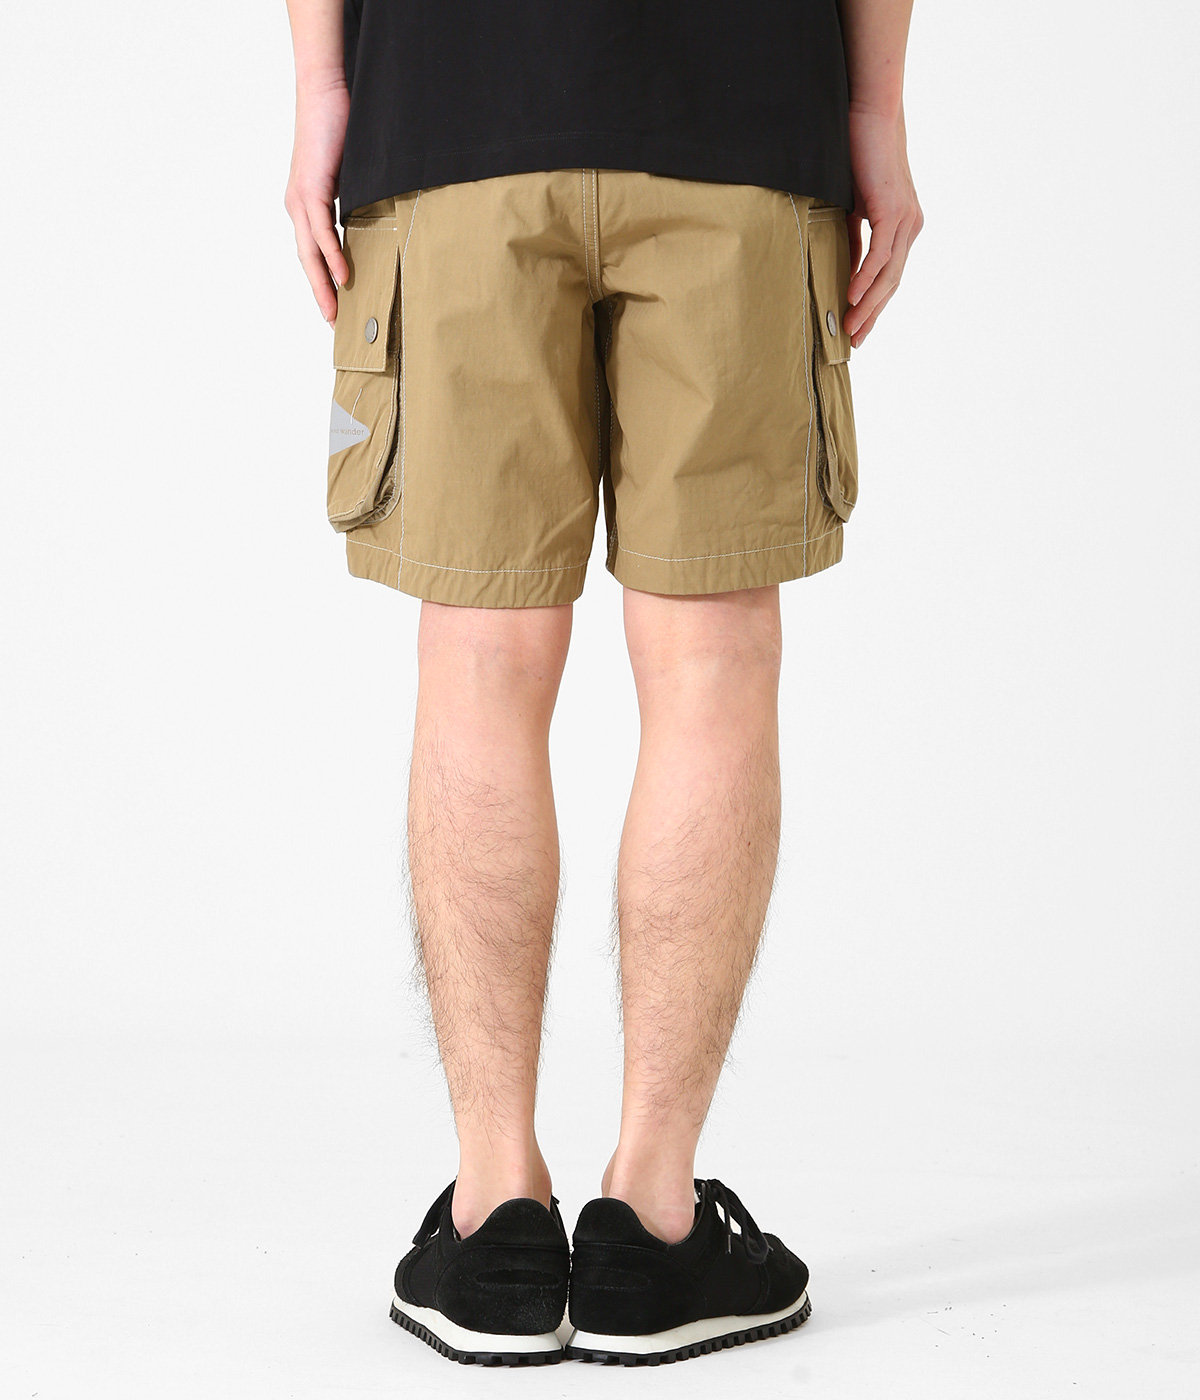 Babour CORDURA solway short pants